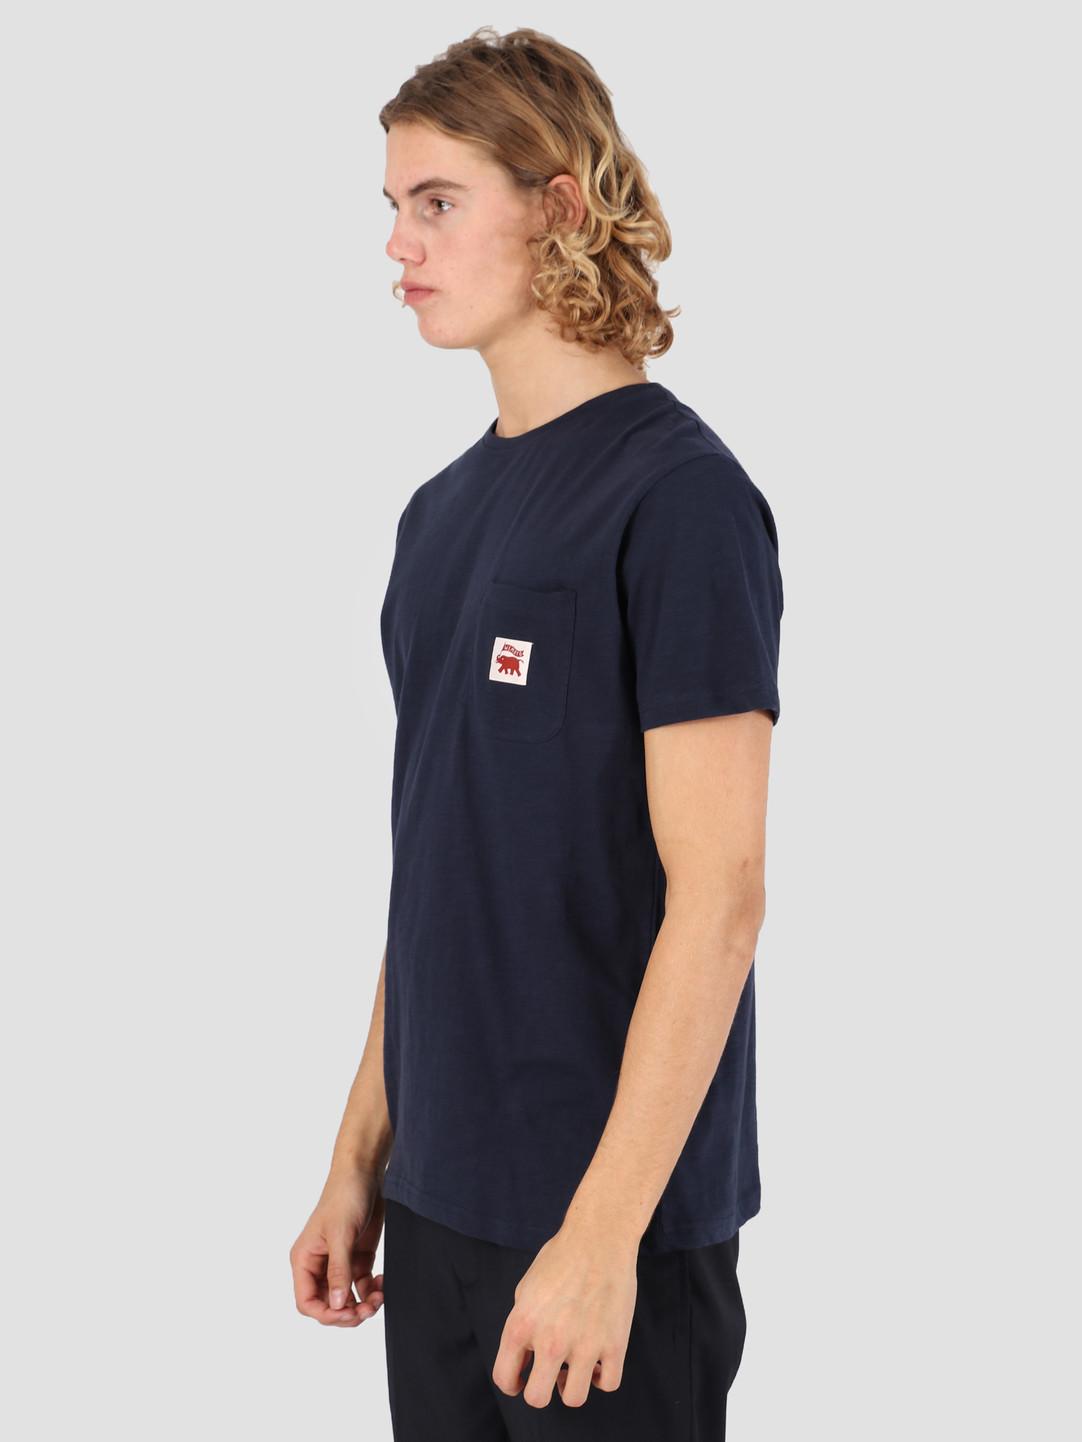 Wemoto Wemoto Toby Jersey Navy Blue 131.237-400